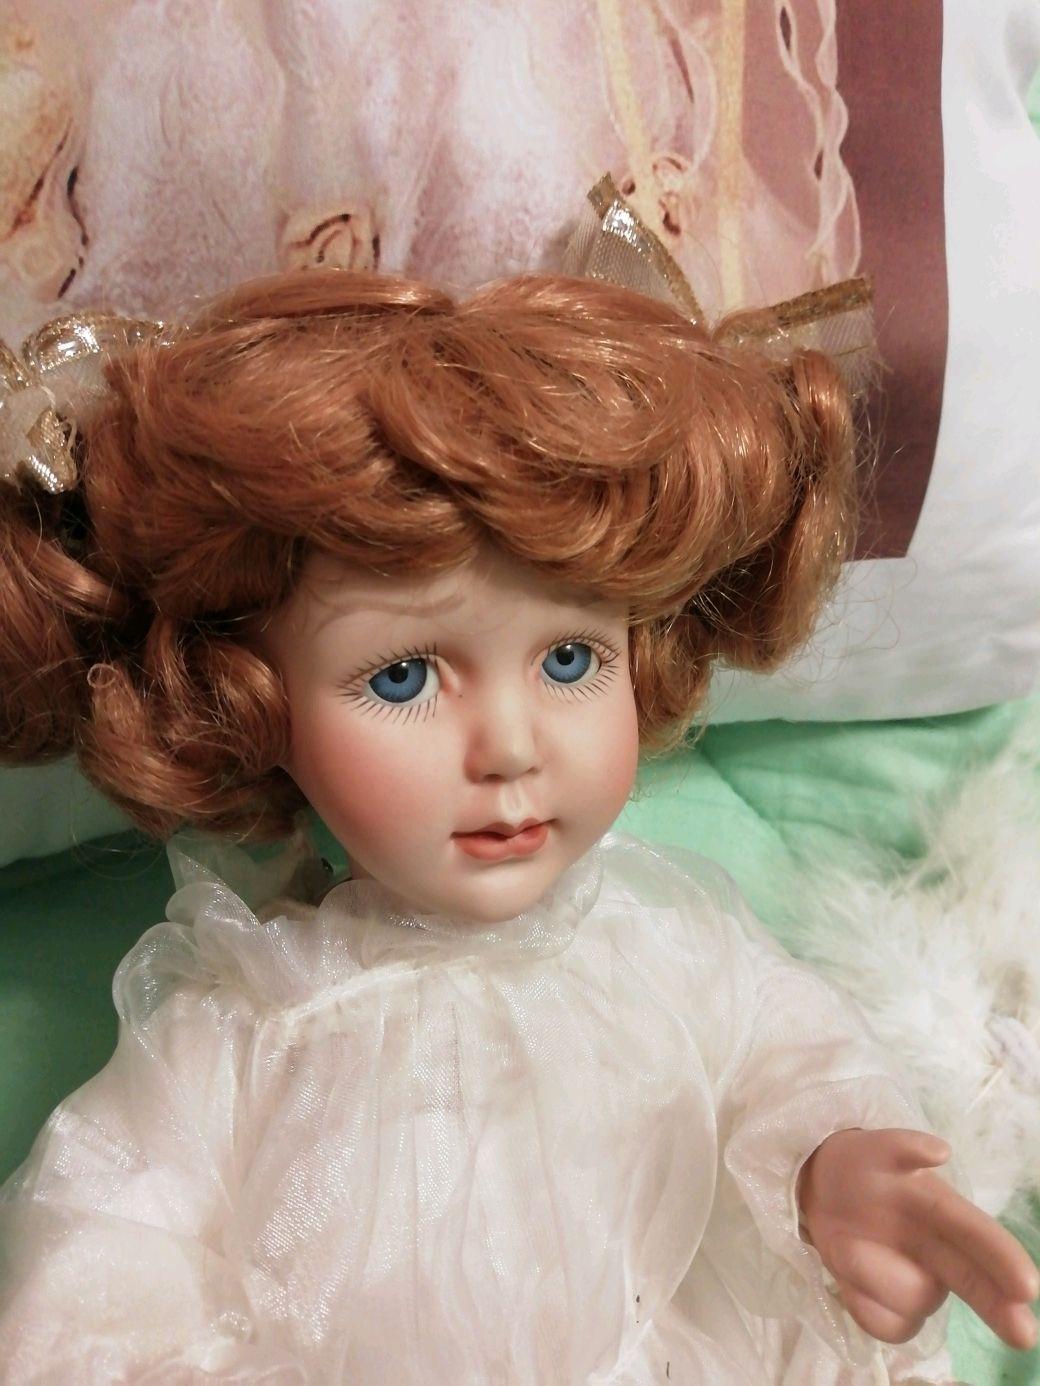 Ангел небесной красоты с крылышками, Коллекционные куклы, Москва, Фото №1